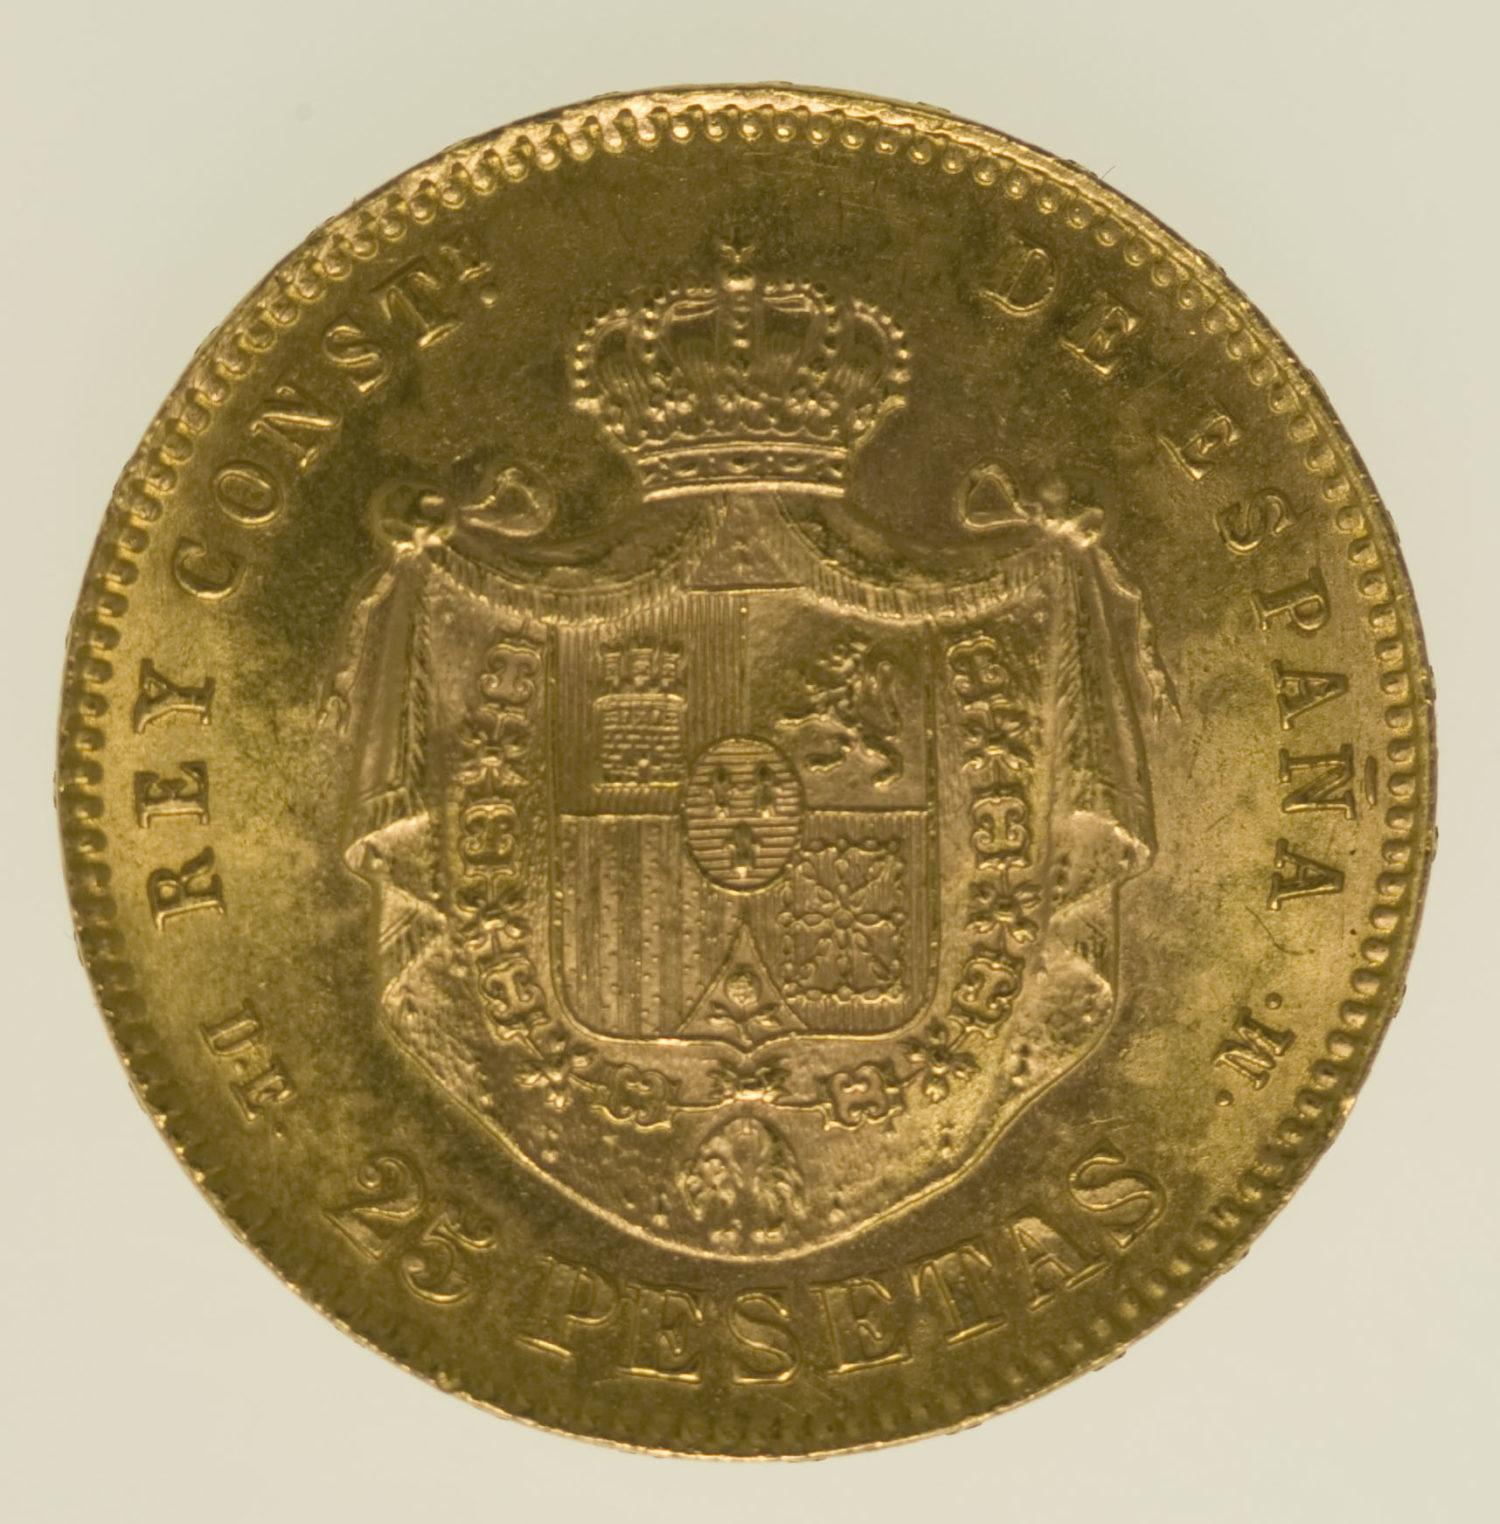 spanien - Spanien Alfonso XII. 25 Pesetas 1876 / 19-62 off. NP